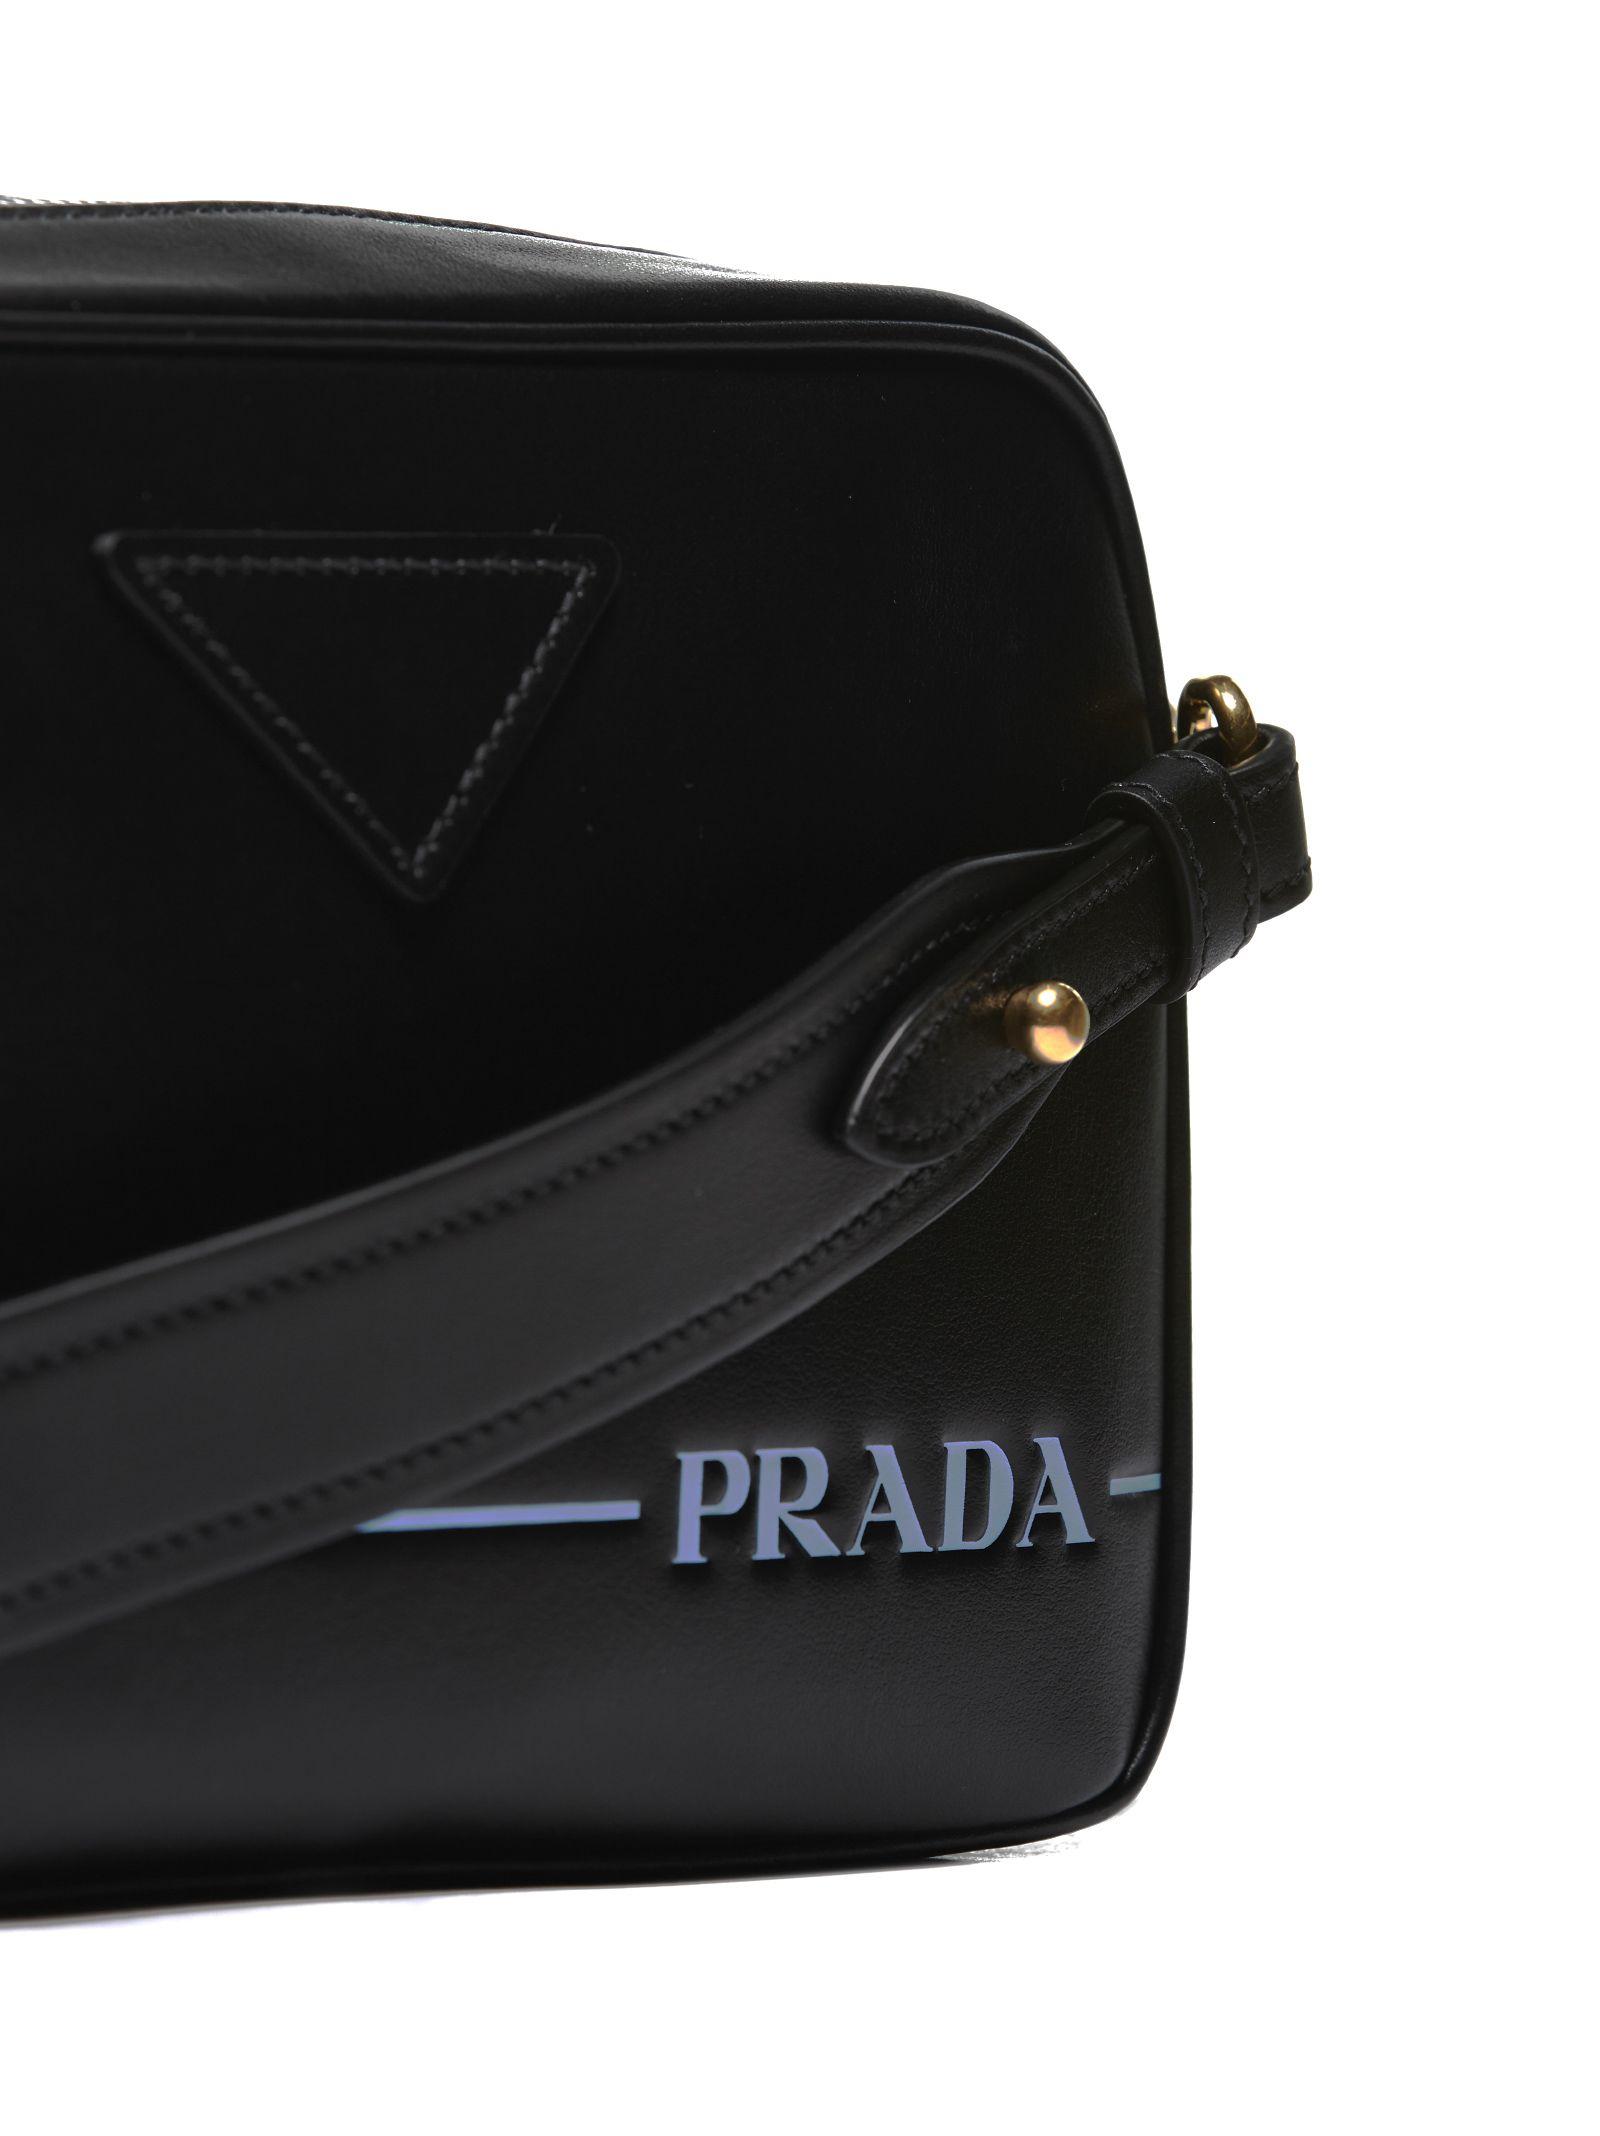 afa3c793647a80 Prada Prada Mirage Shoulder Bag - Black - 10642834   italist